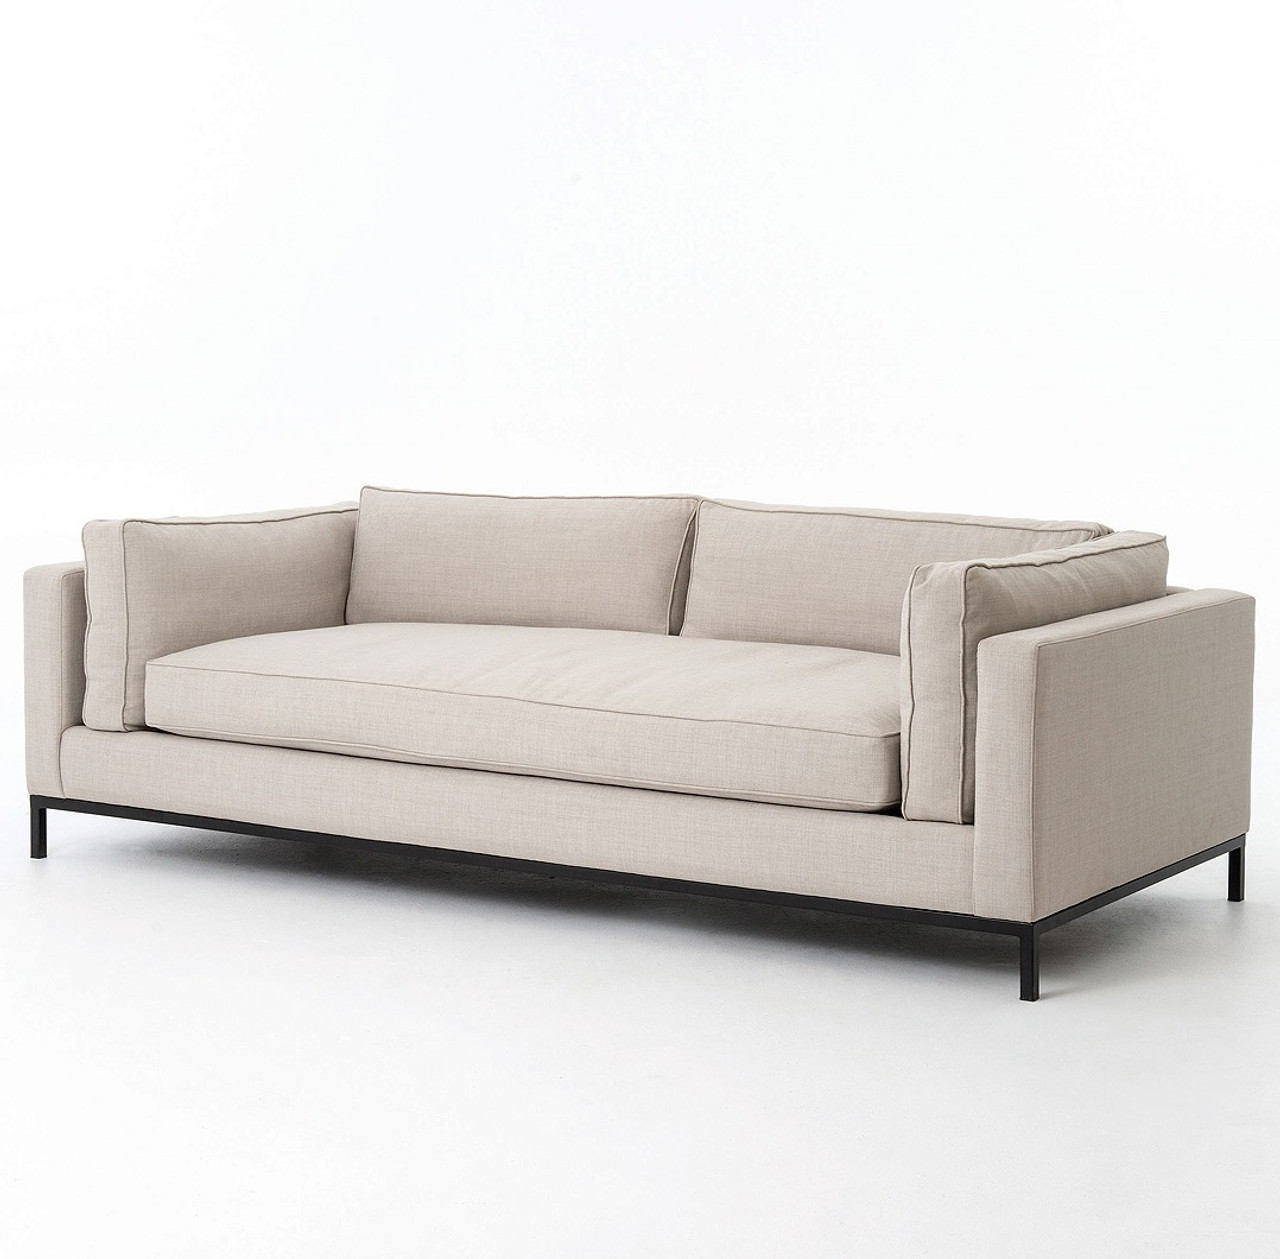 Exceptional Grammercy Modern Linen Sofa